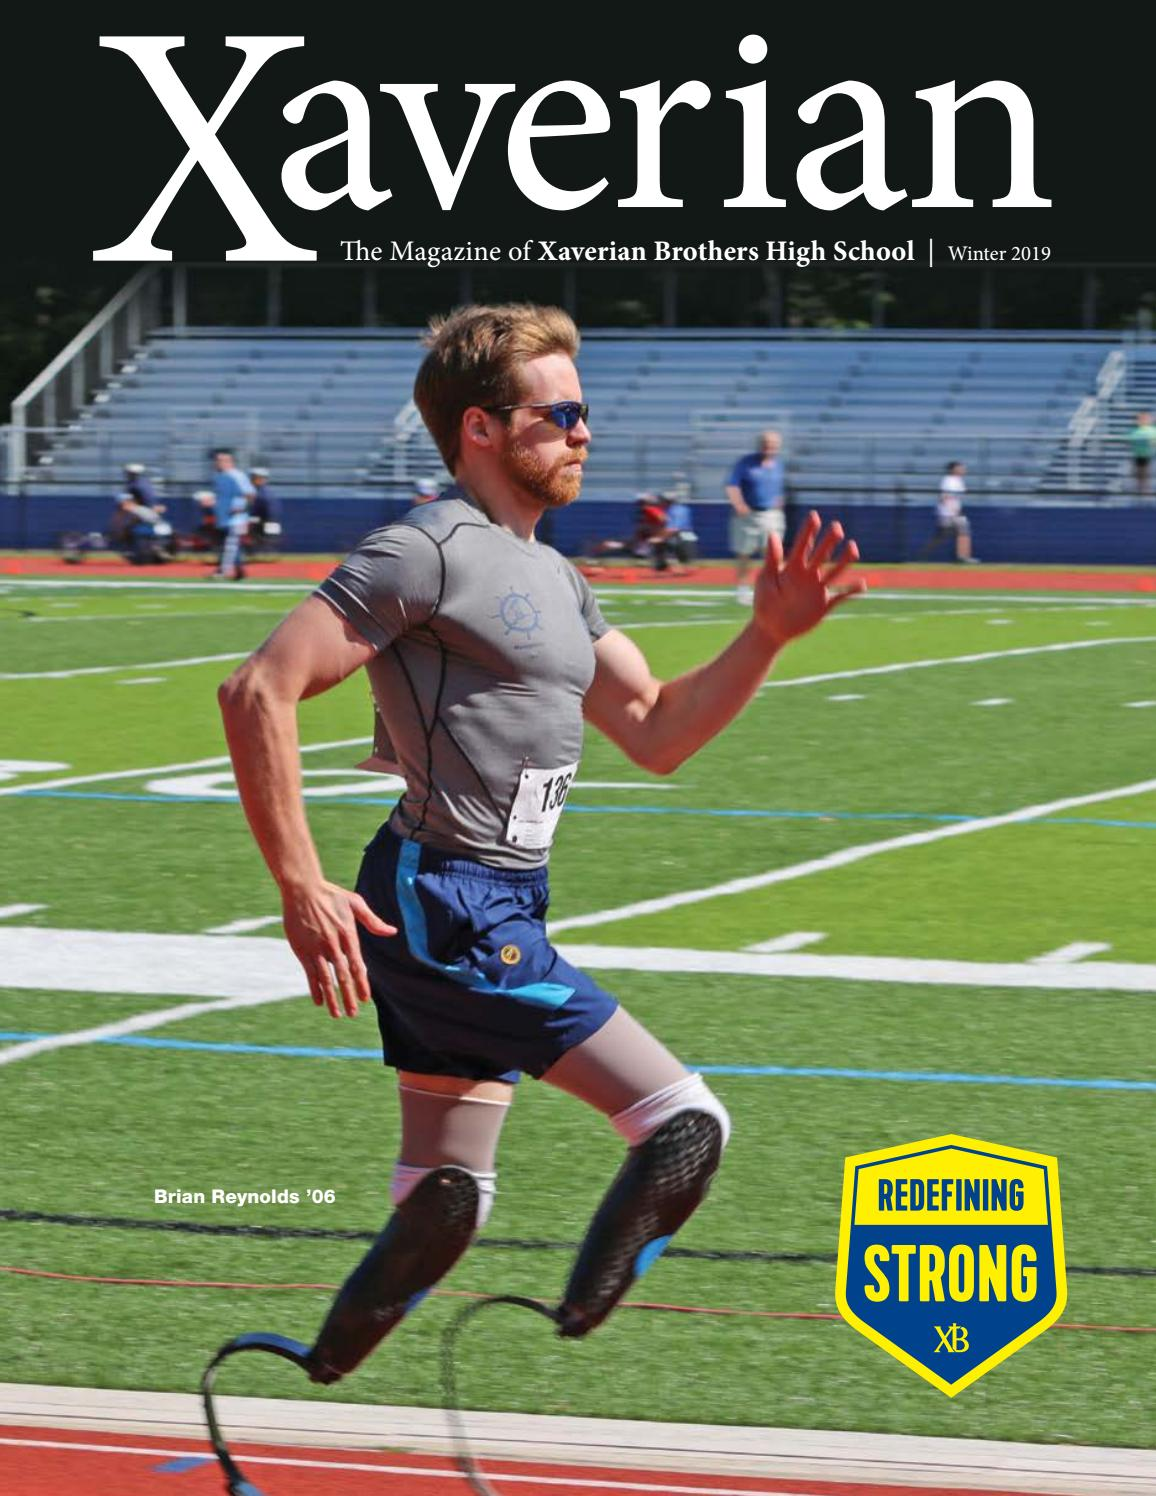 2d41ed3179 Winter 2019 - Xaverian Magazine by Xaverian Brothers High School - issuu